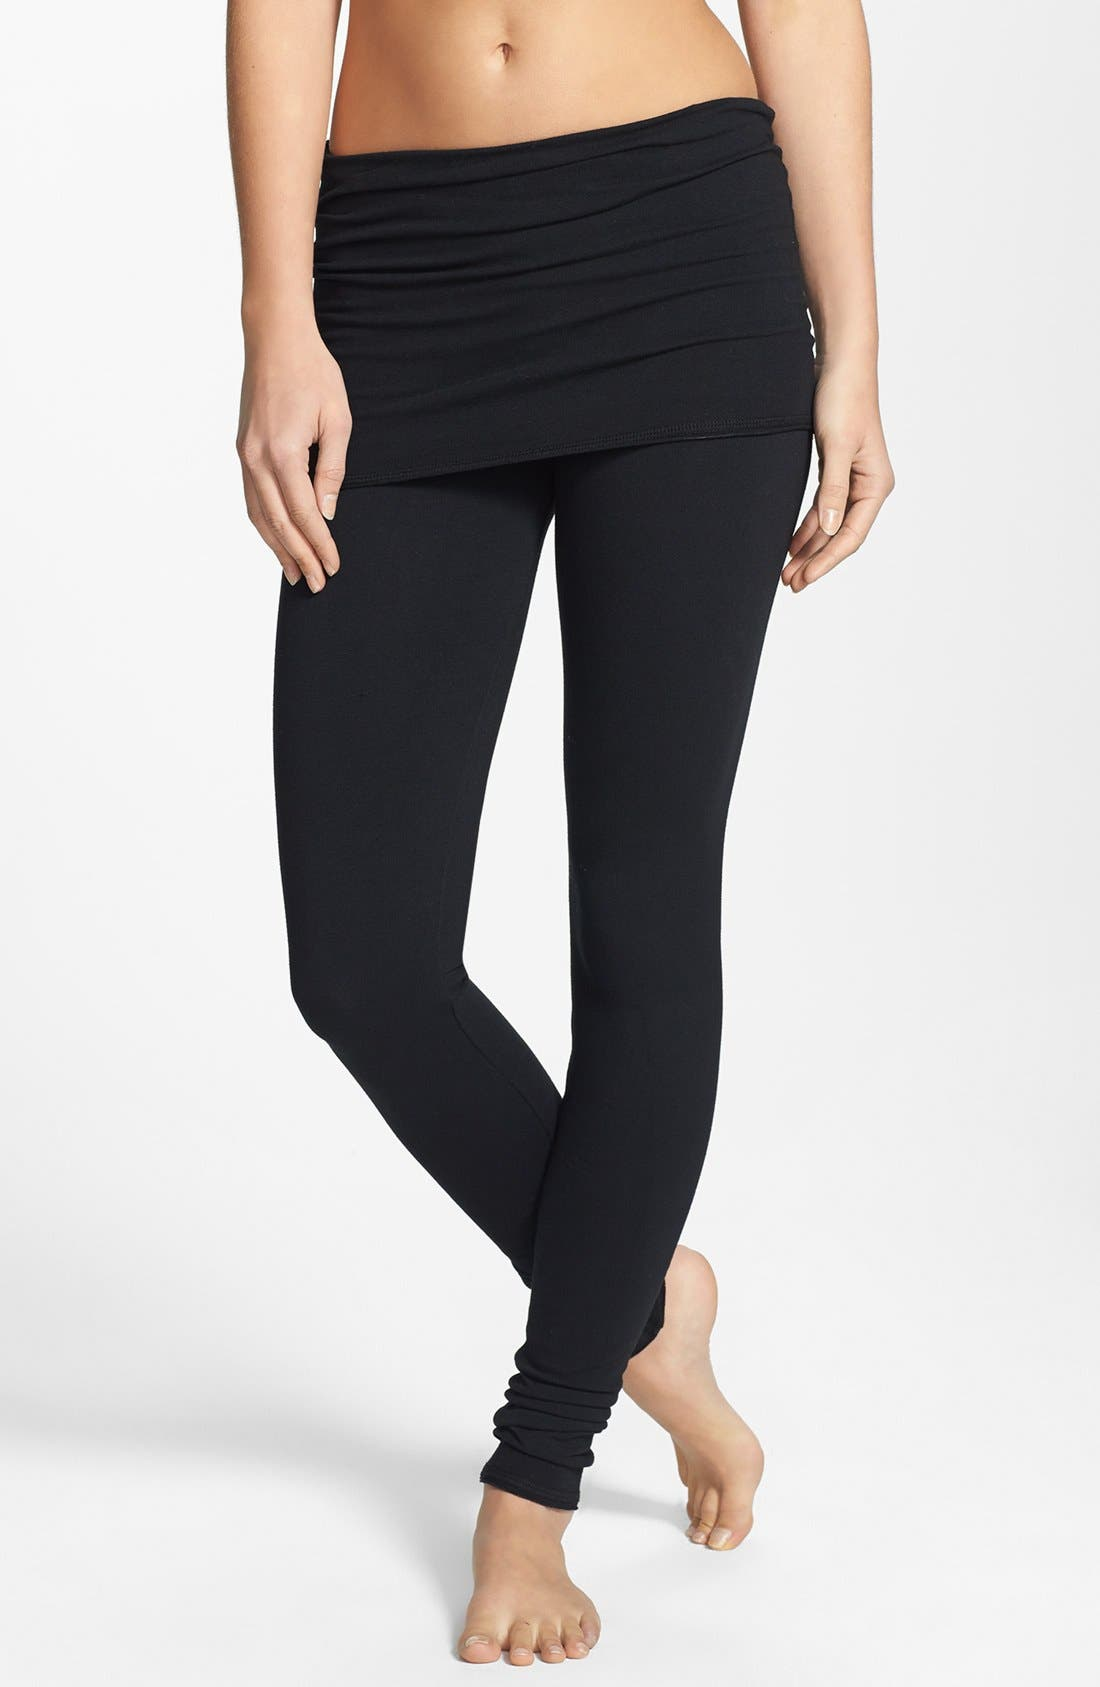 Alternate Image 1 Selected - Solow Skirted Yoga Leggings